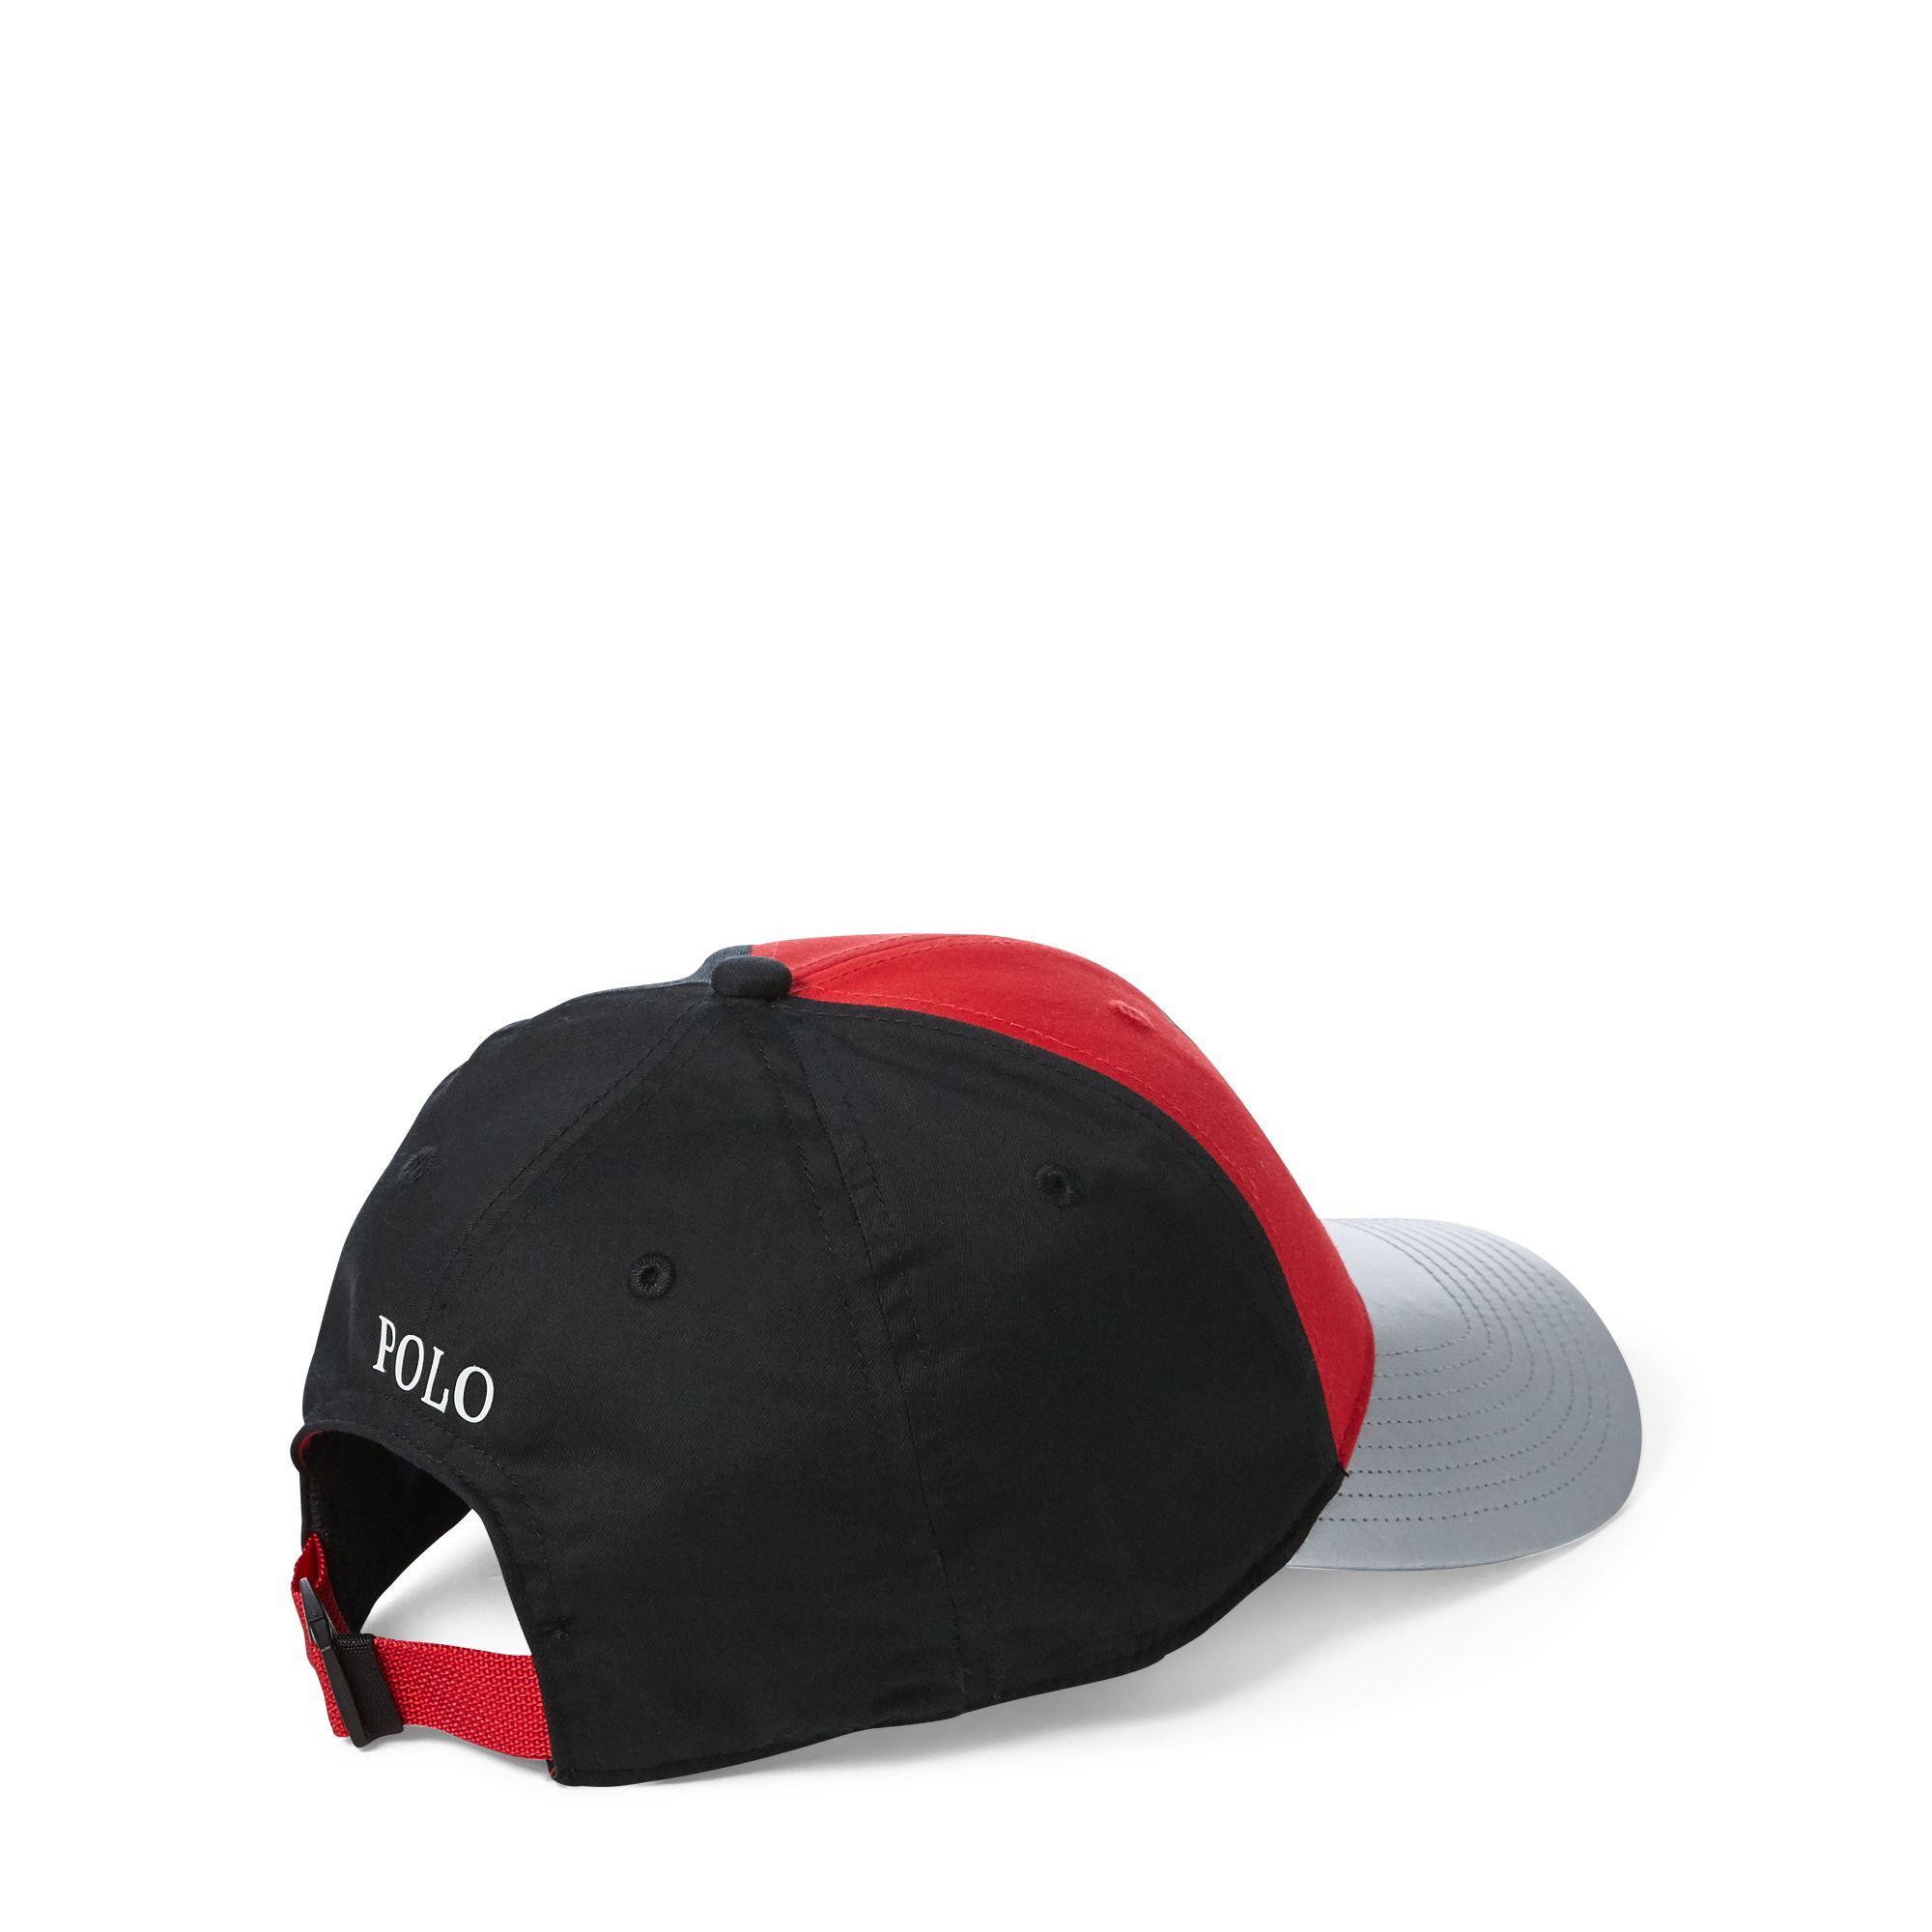 8752cee8894 Polo Ralph Lauren - Red Colour-blocked P-wing Cap for Men - Lyst. View  fullscreen